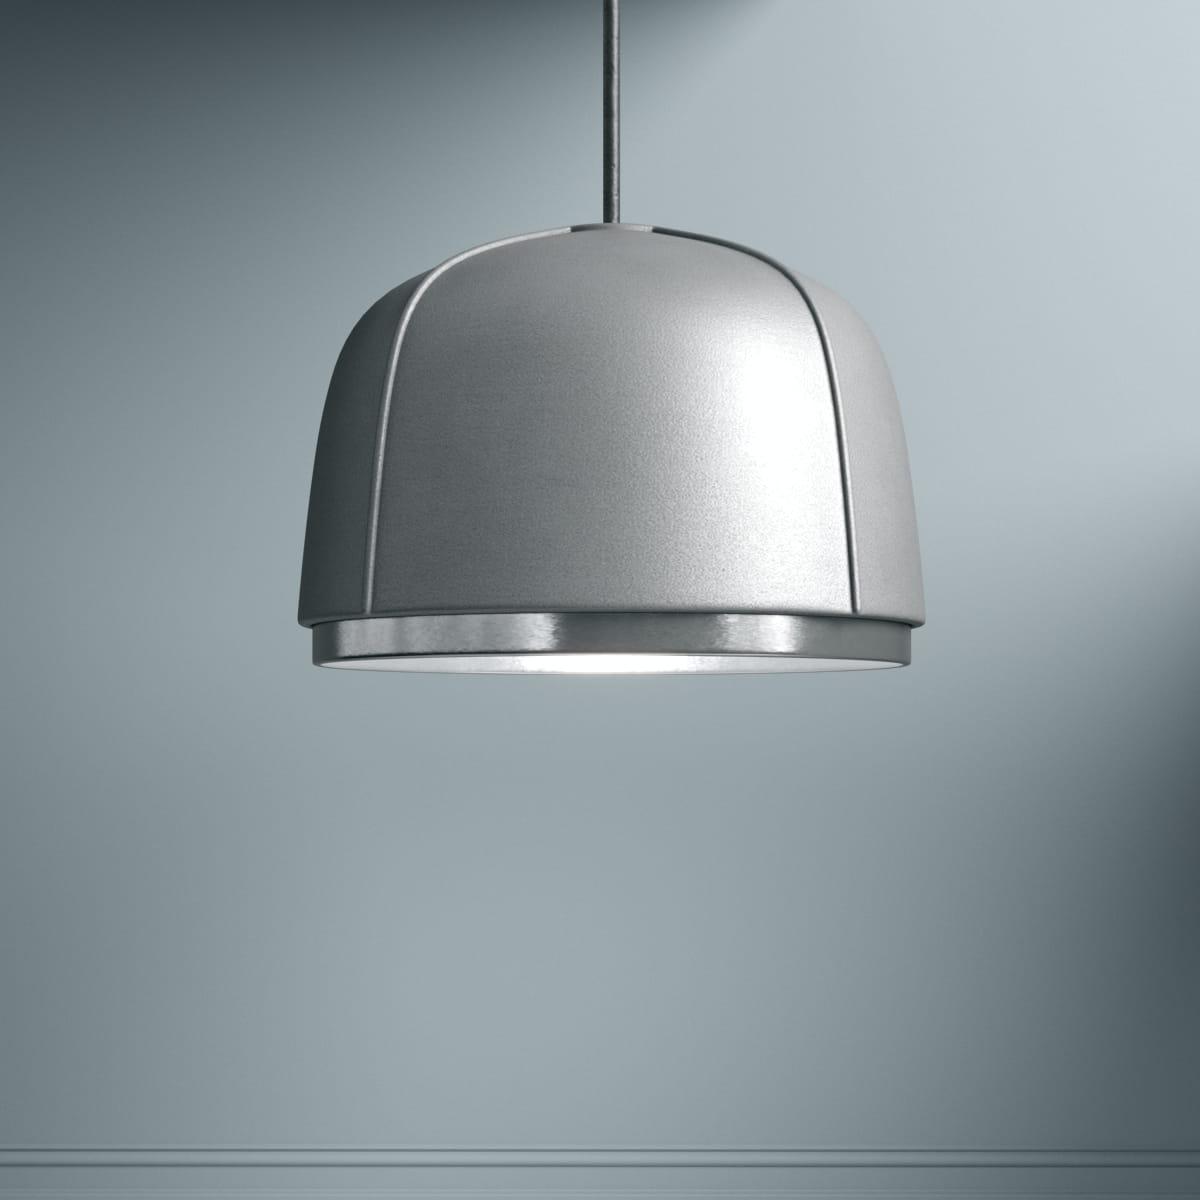 lamp 62 AM247